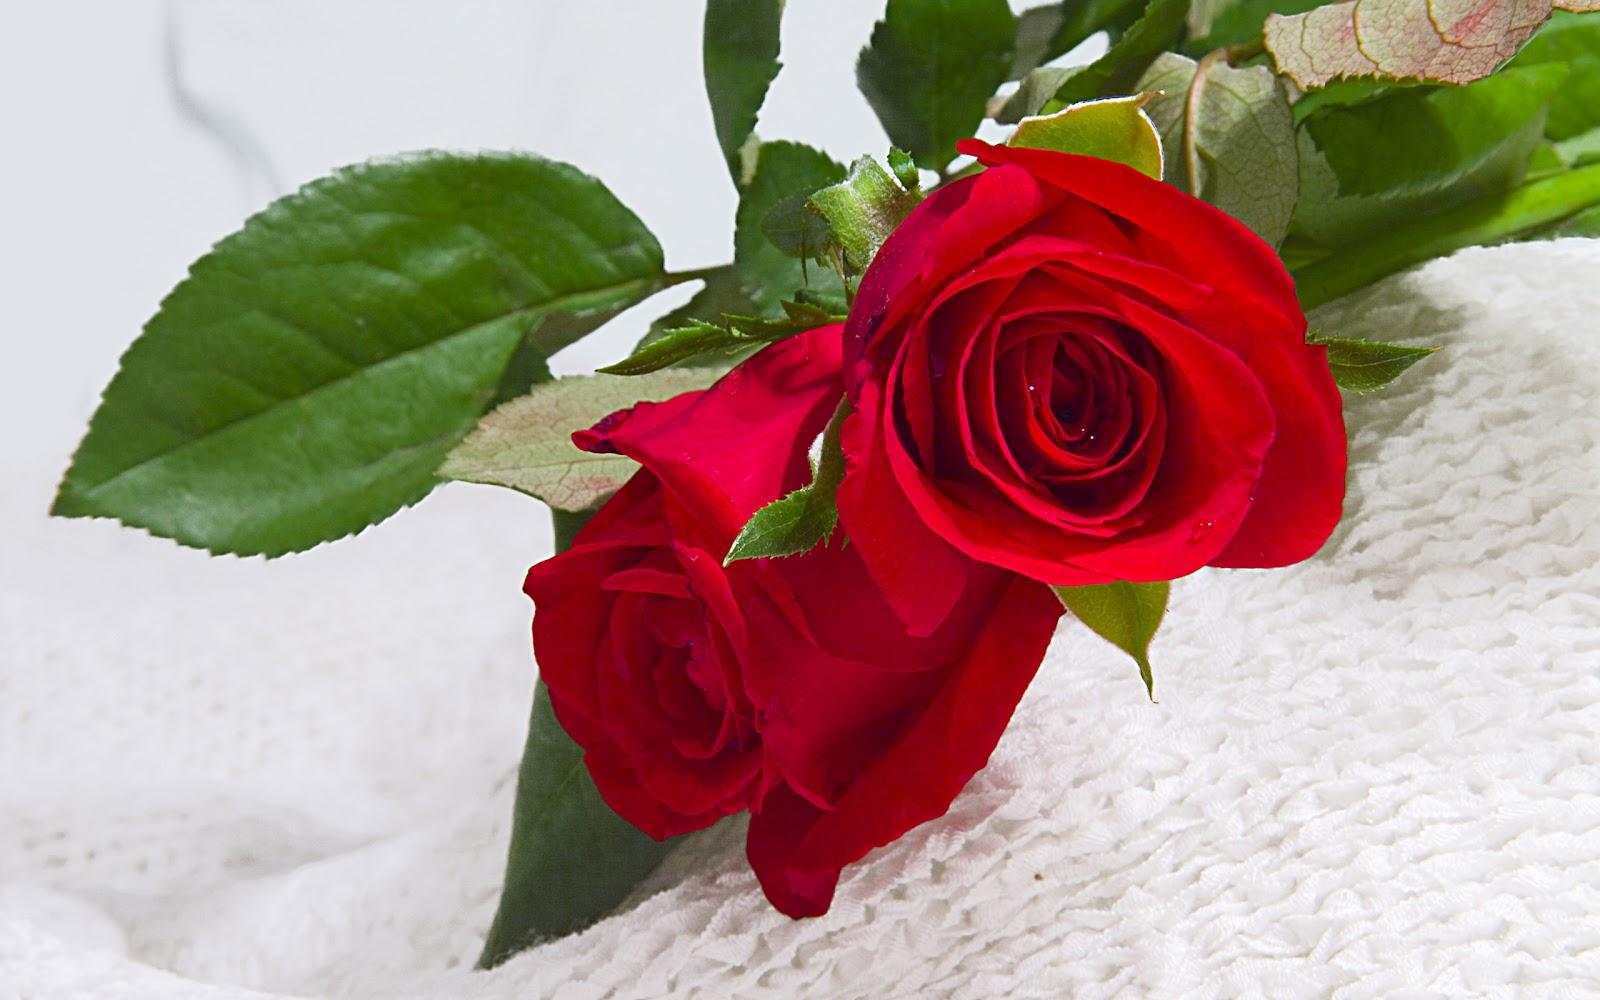 بالصور صور ورد حب , اجمل صور لورد حب جميل ورومانسى 215 3